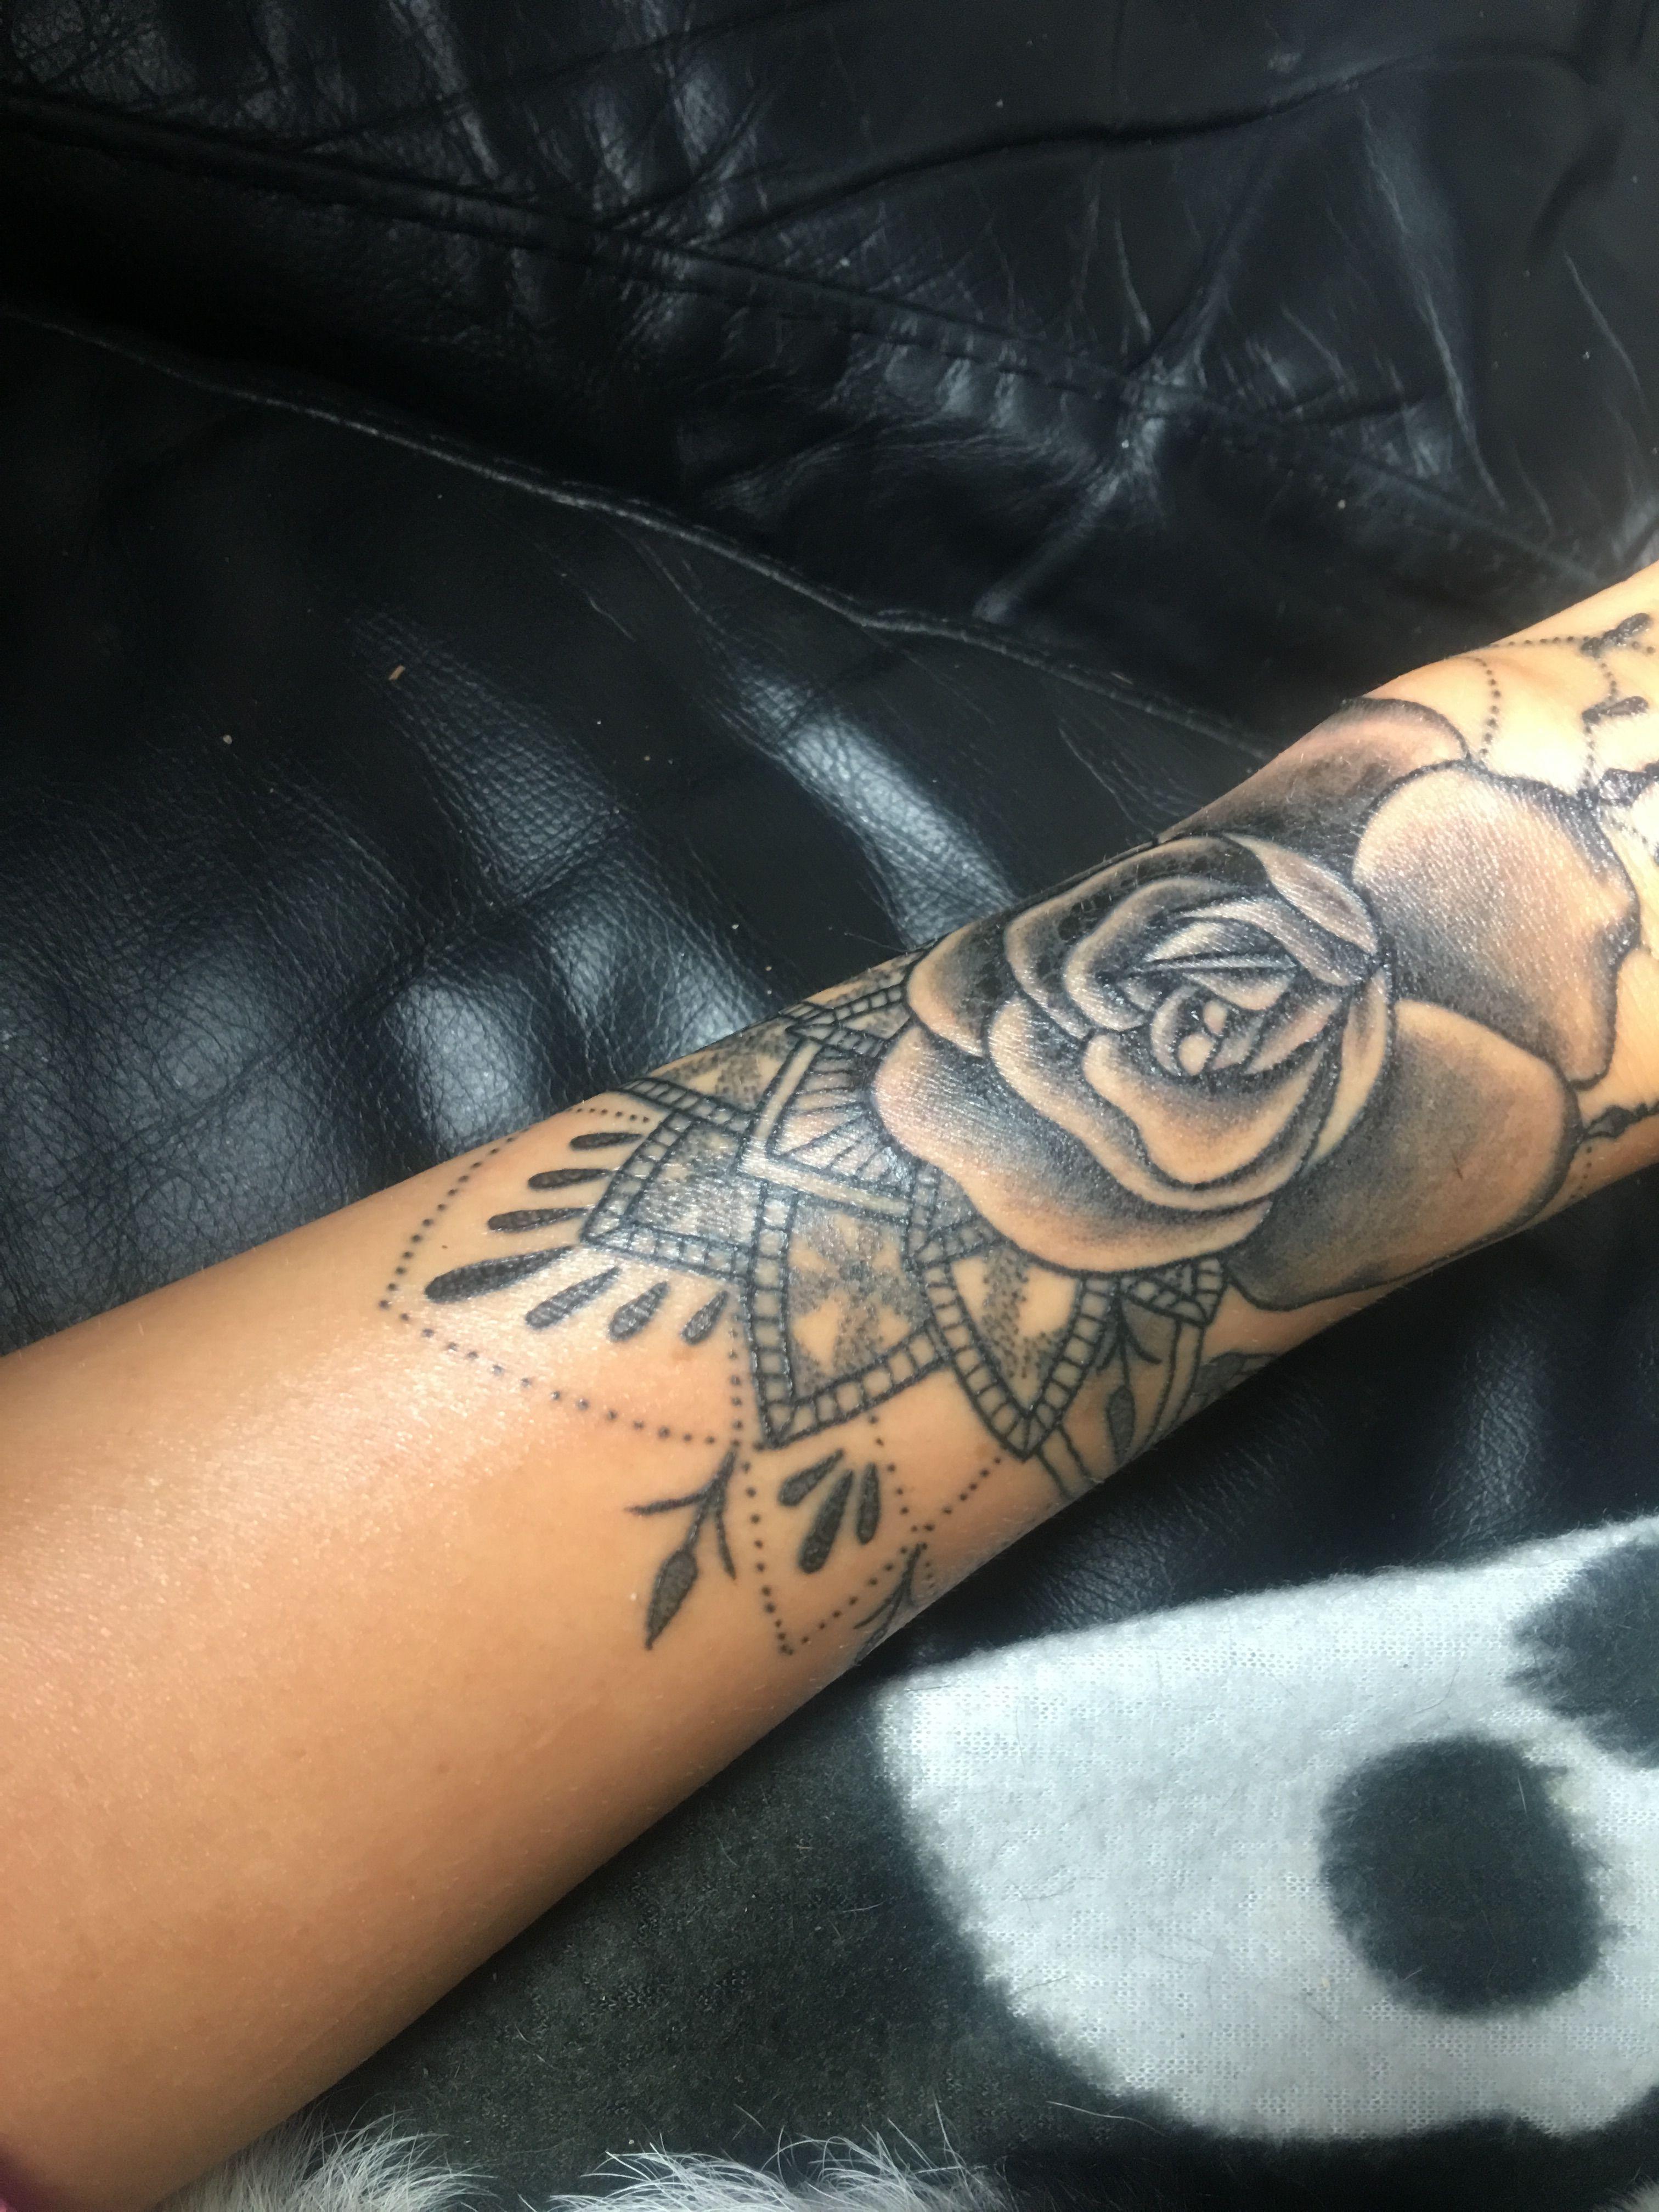 Pin by Francisca on Tattoo Flower wrist tattoos, Cuff